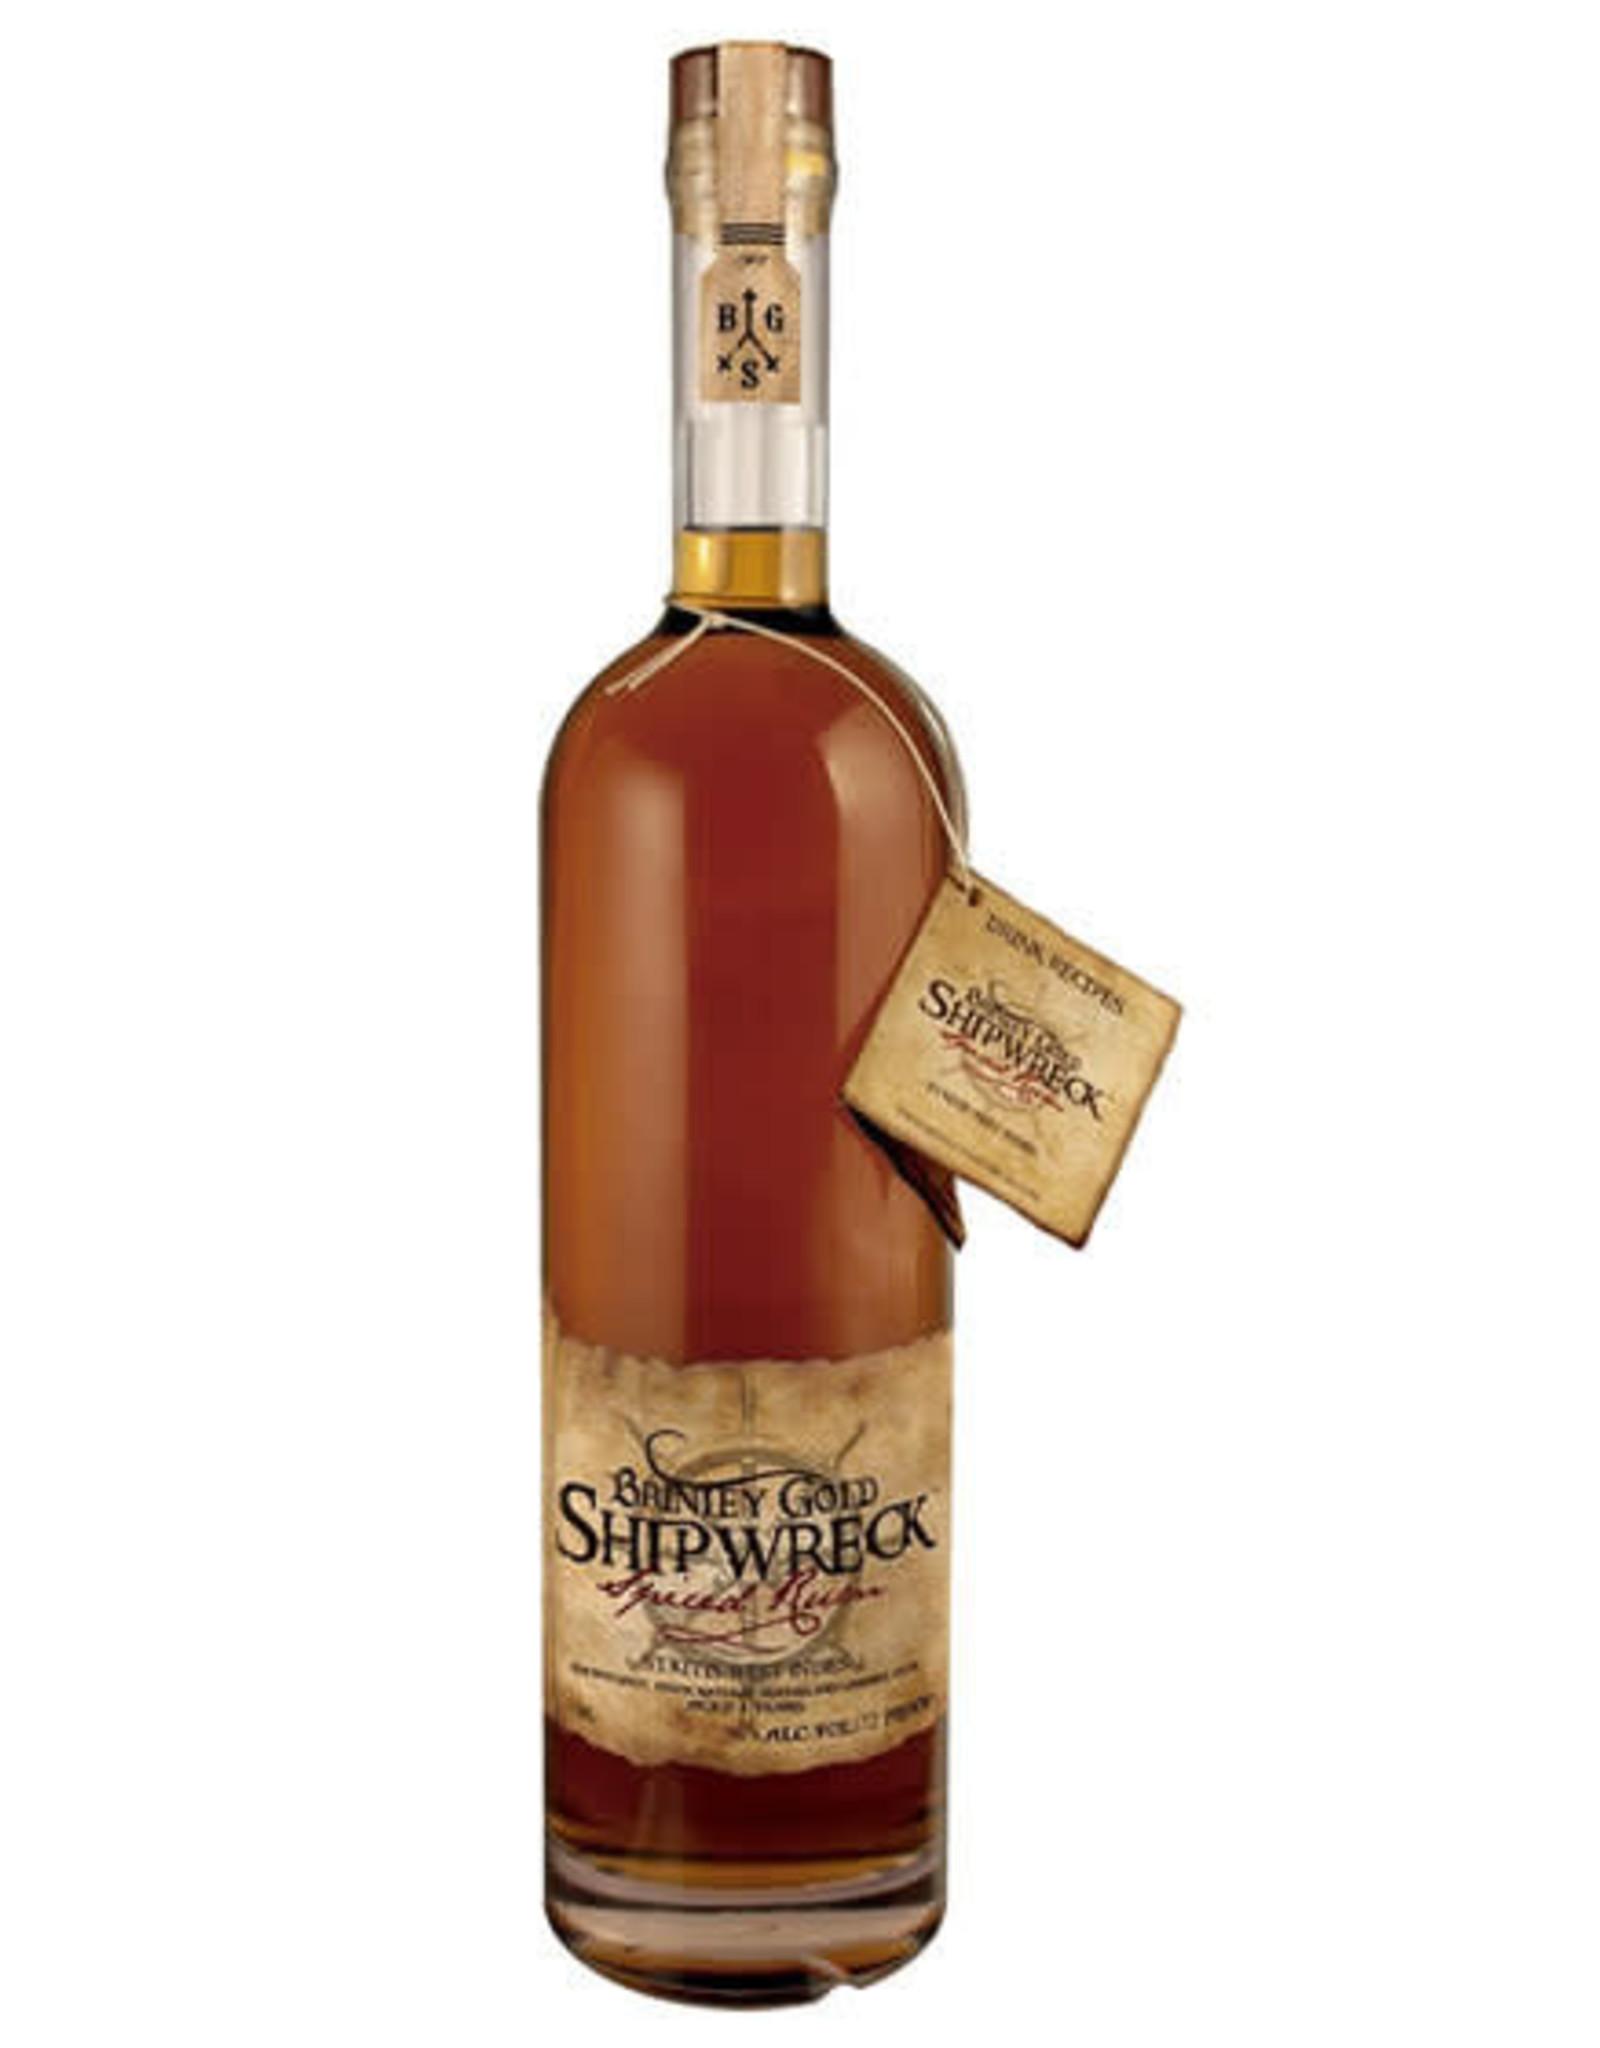 Shipwreck Spiced Rum 750ml